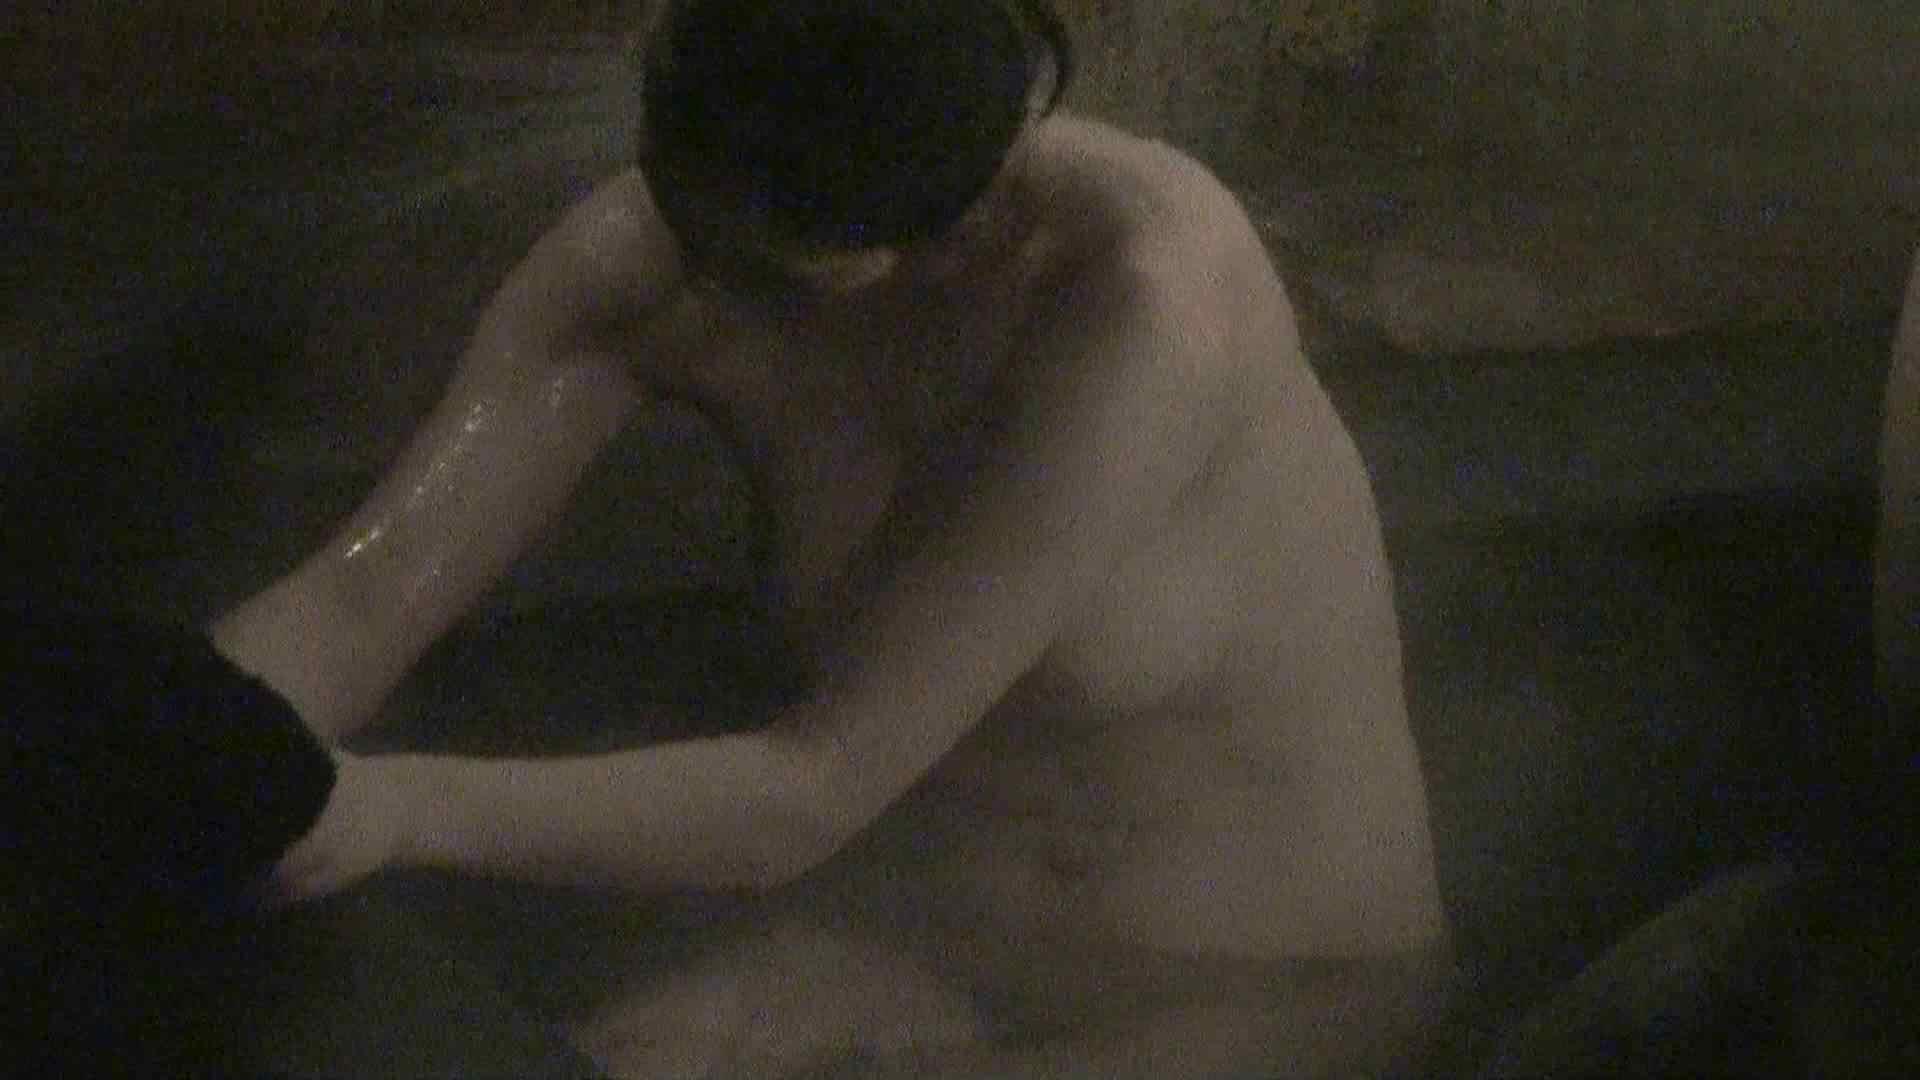 Aquaな露天風呂Vol.315 0 | 0  66連発 35